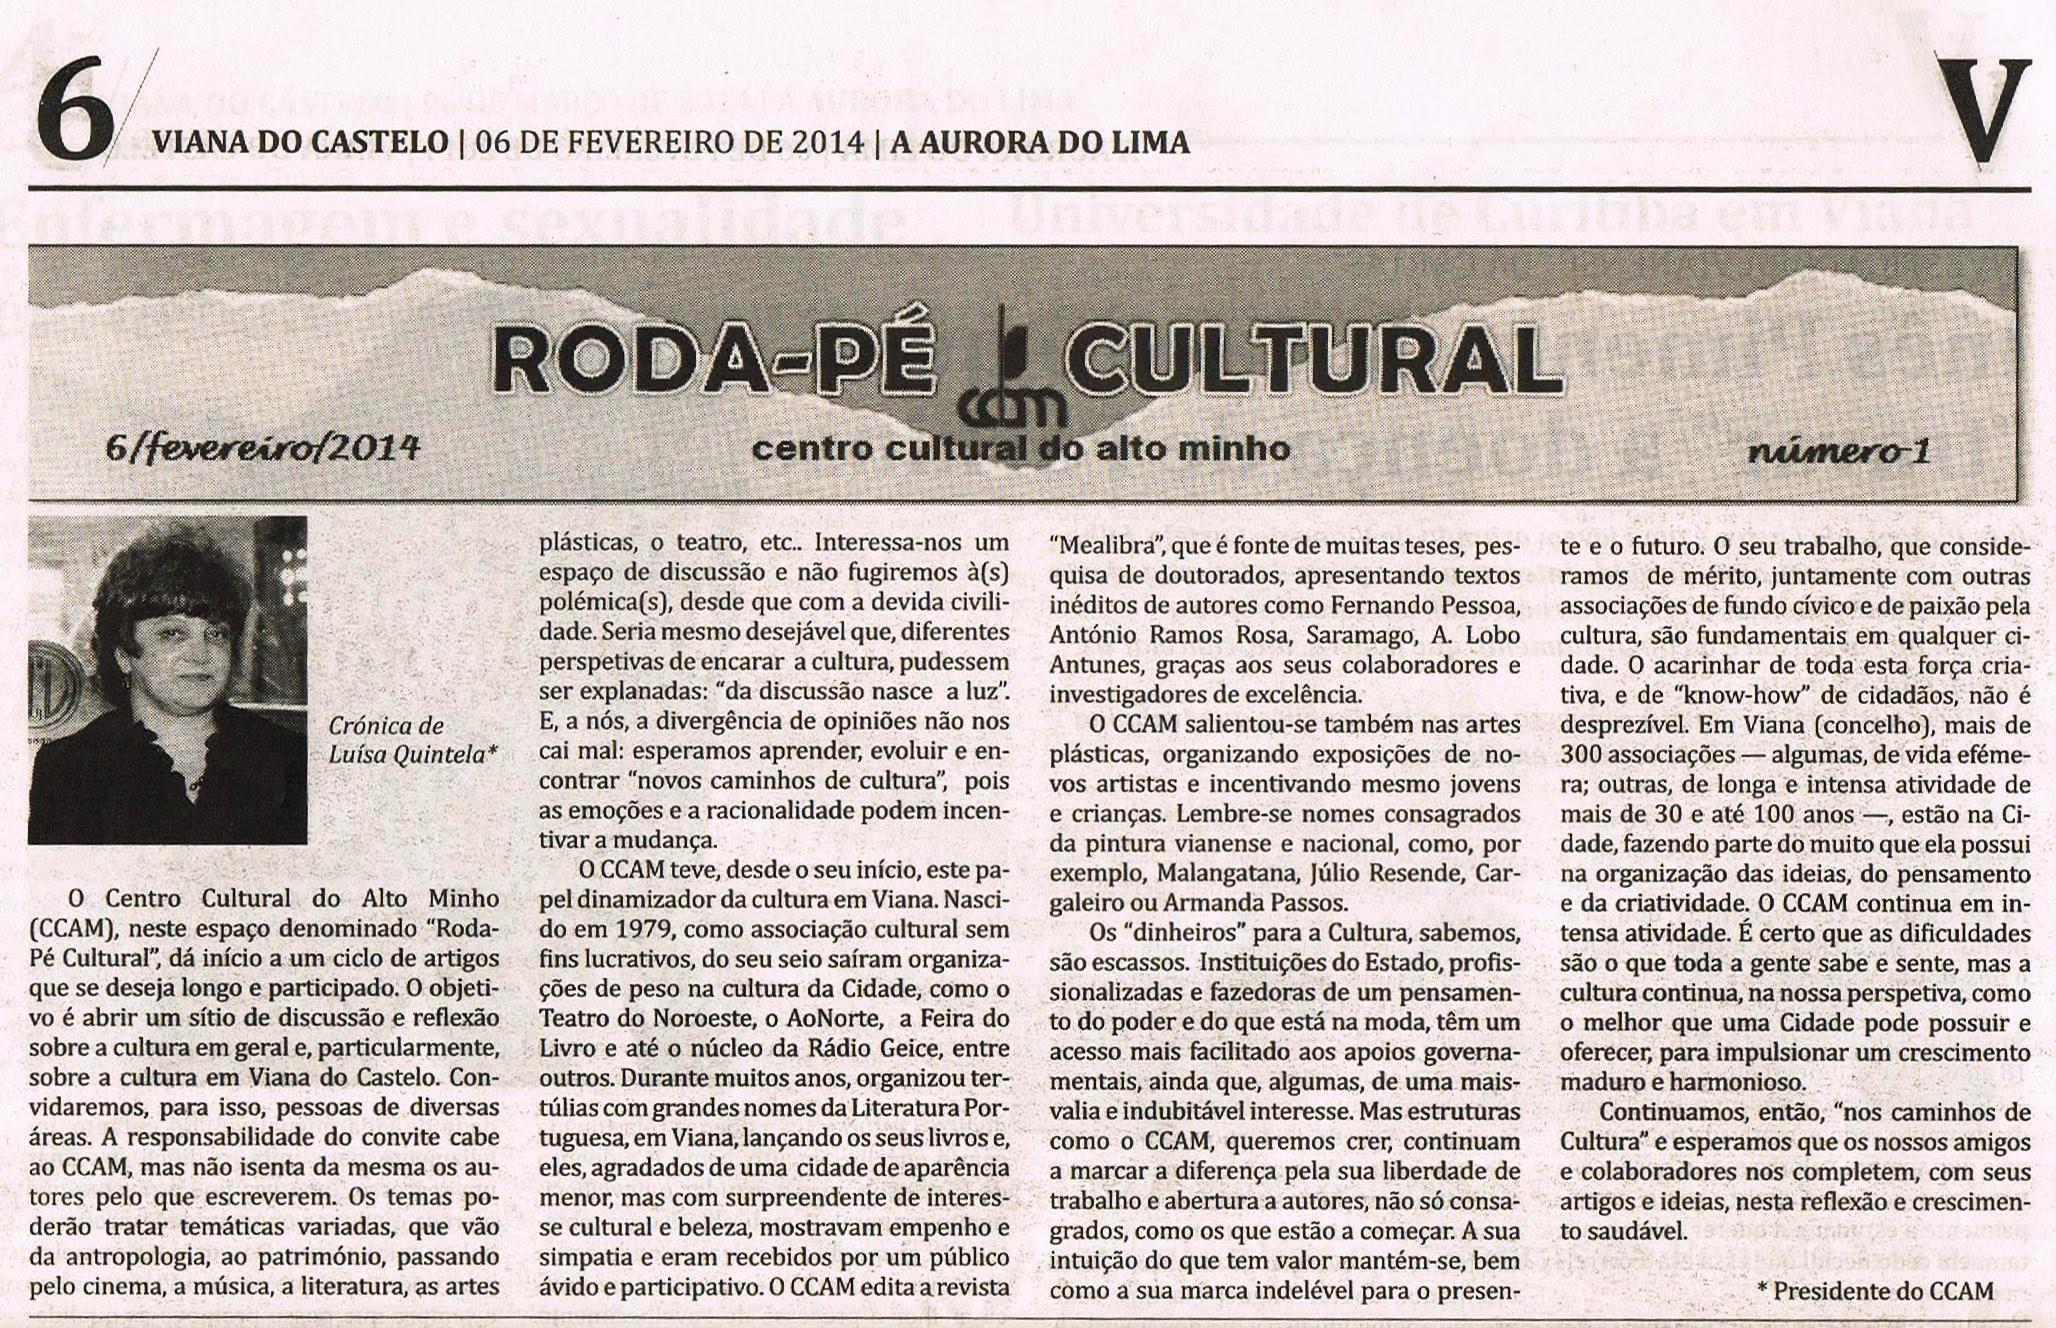 https://sites.google.com/a/centroculturaldoaltominho.org/ccam/_/rsrc/1392634811635/actividades-realizadas/2014/Roda-p%C3%A9_cultural_1.jpeg?width=100%25